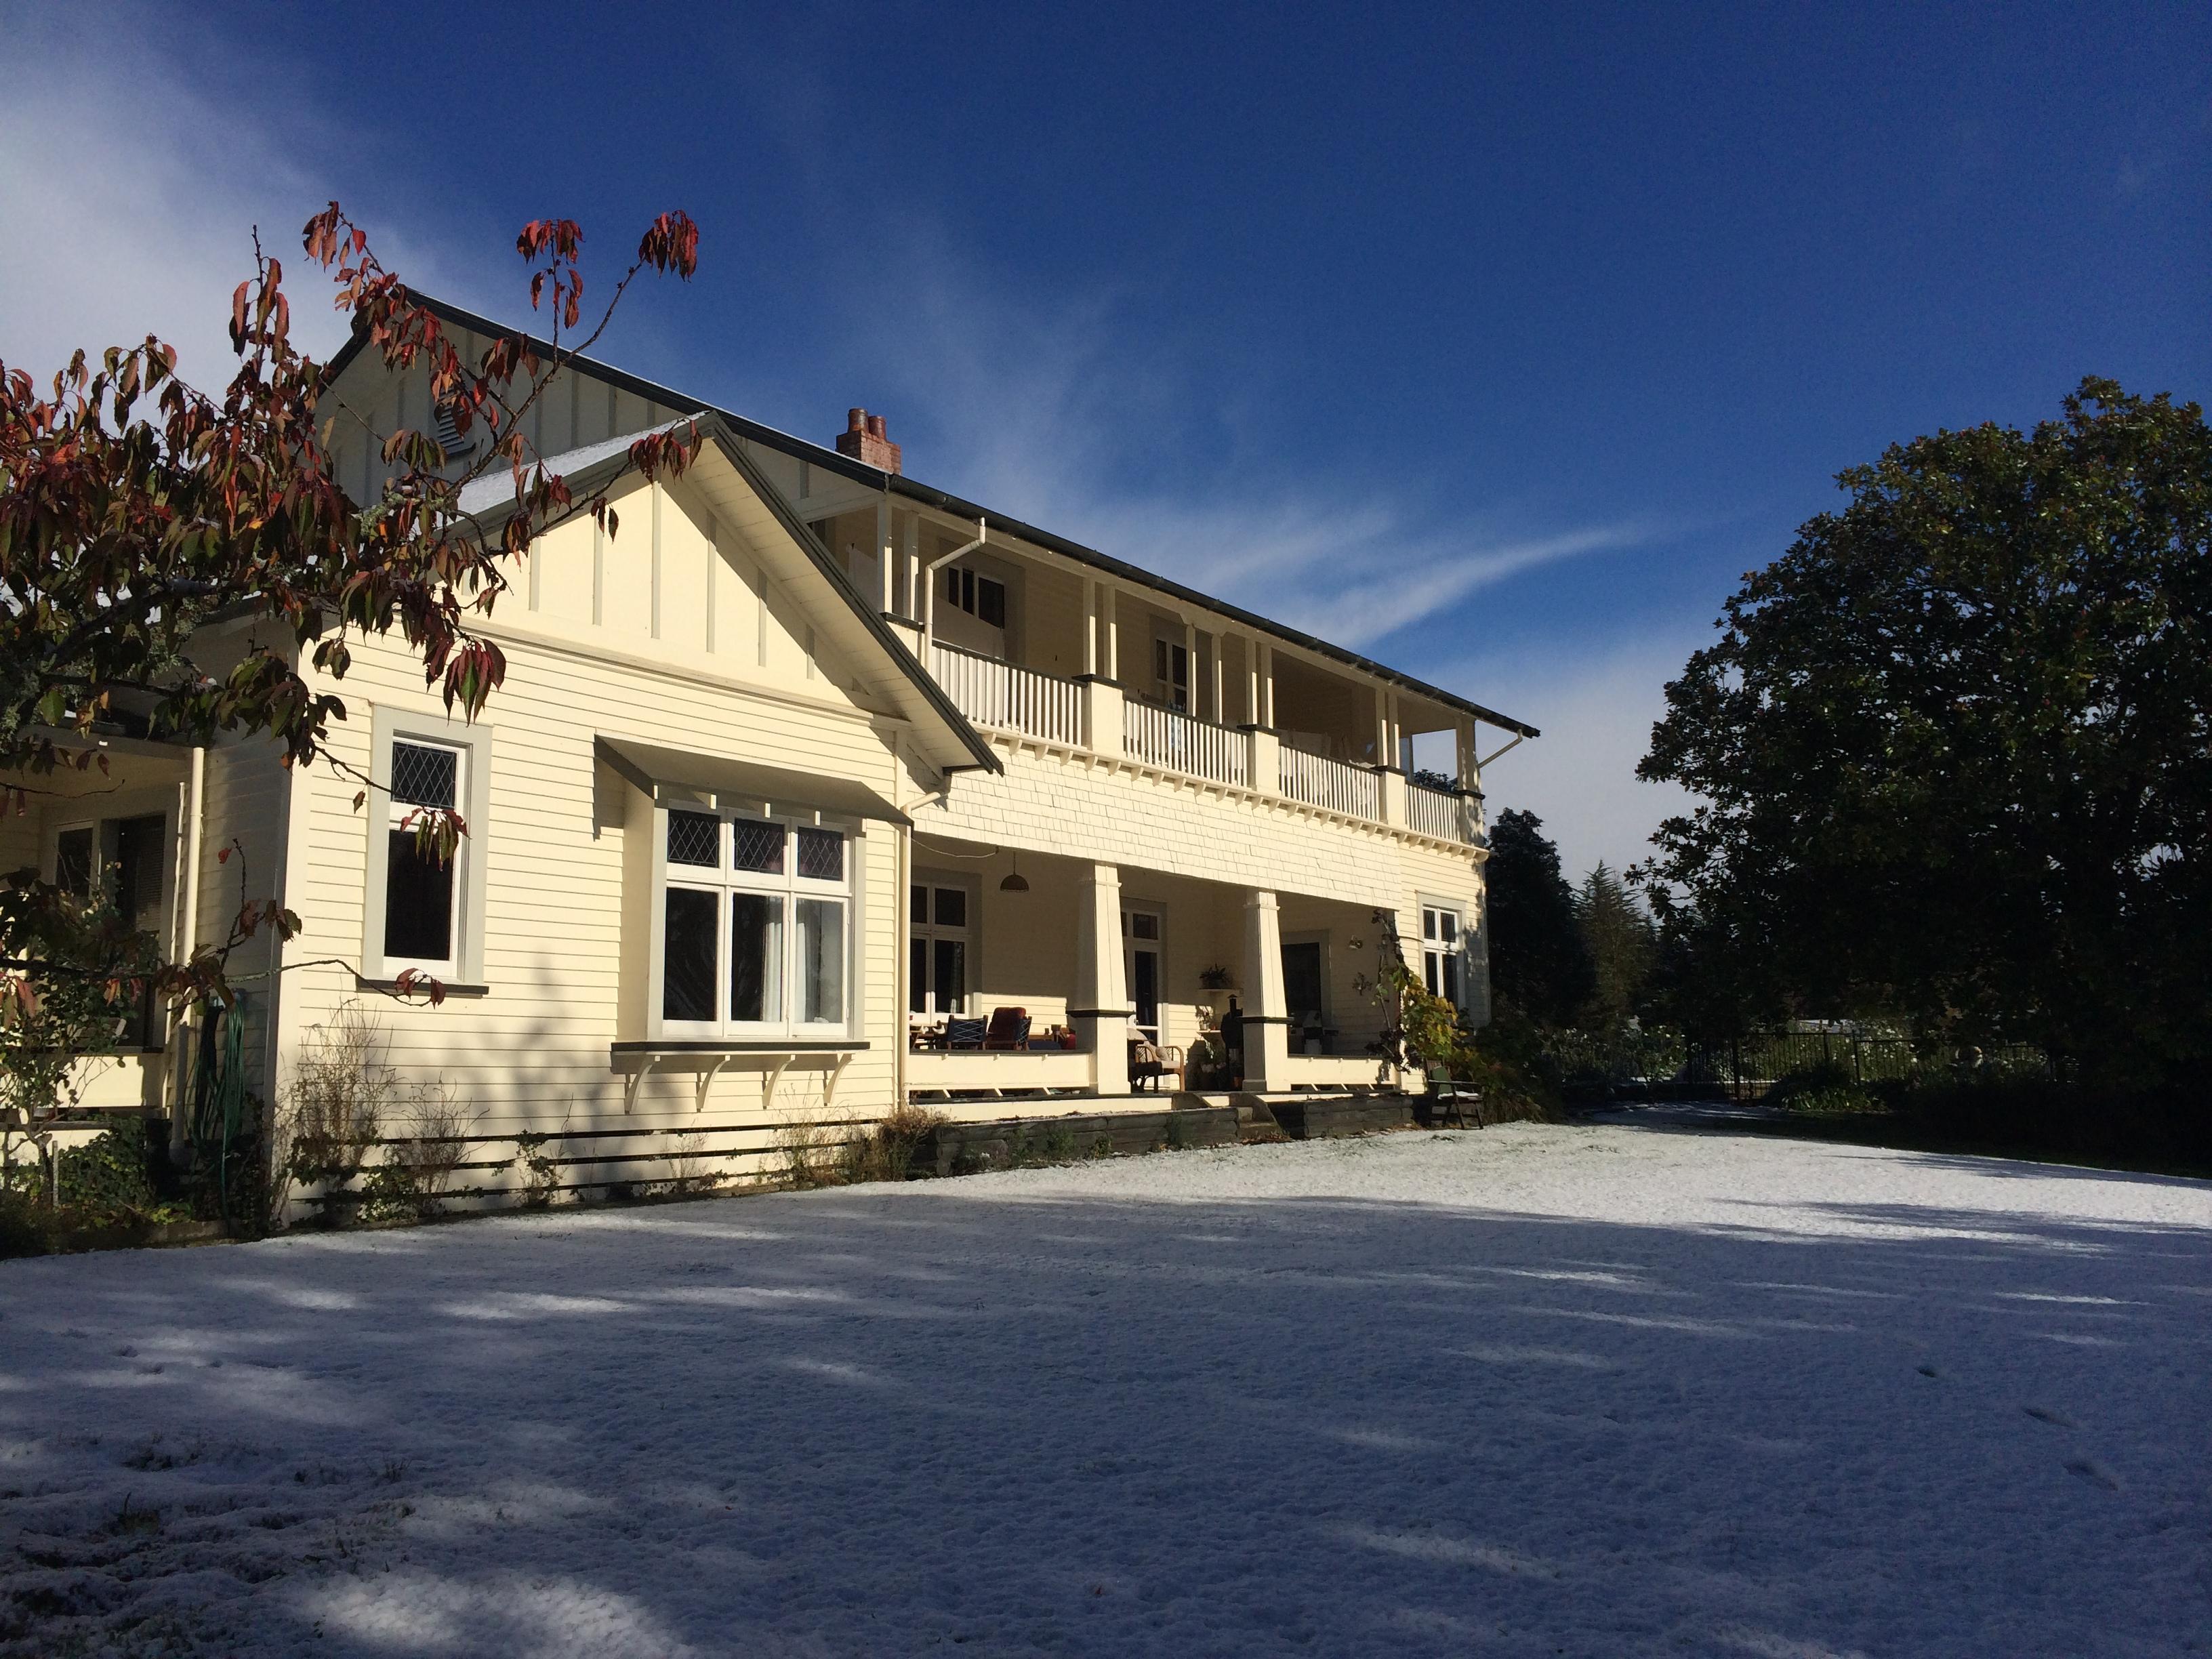 Waiwhenua Homestead in the snow